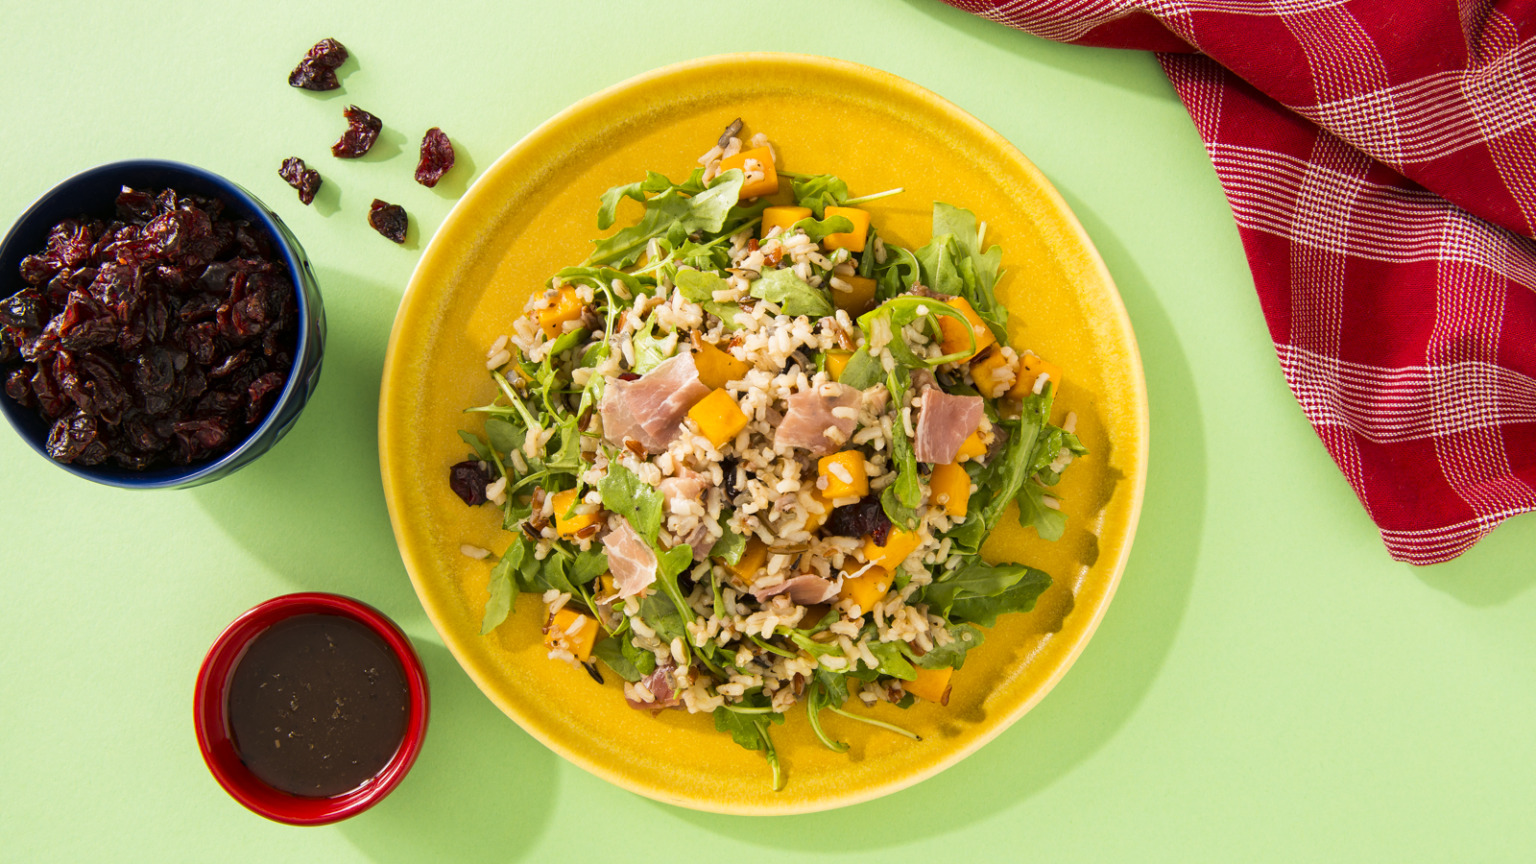 Arugula, Rice and Quinoa Thanksgiving Salad